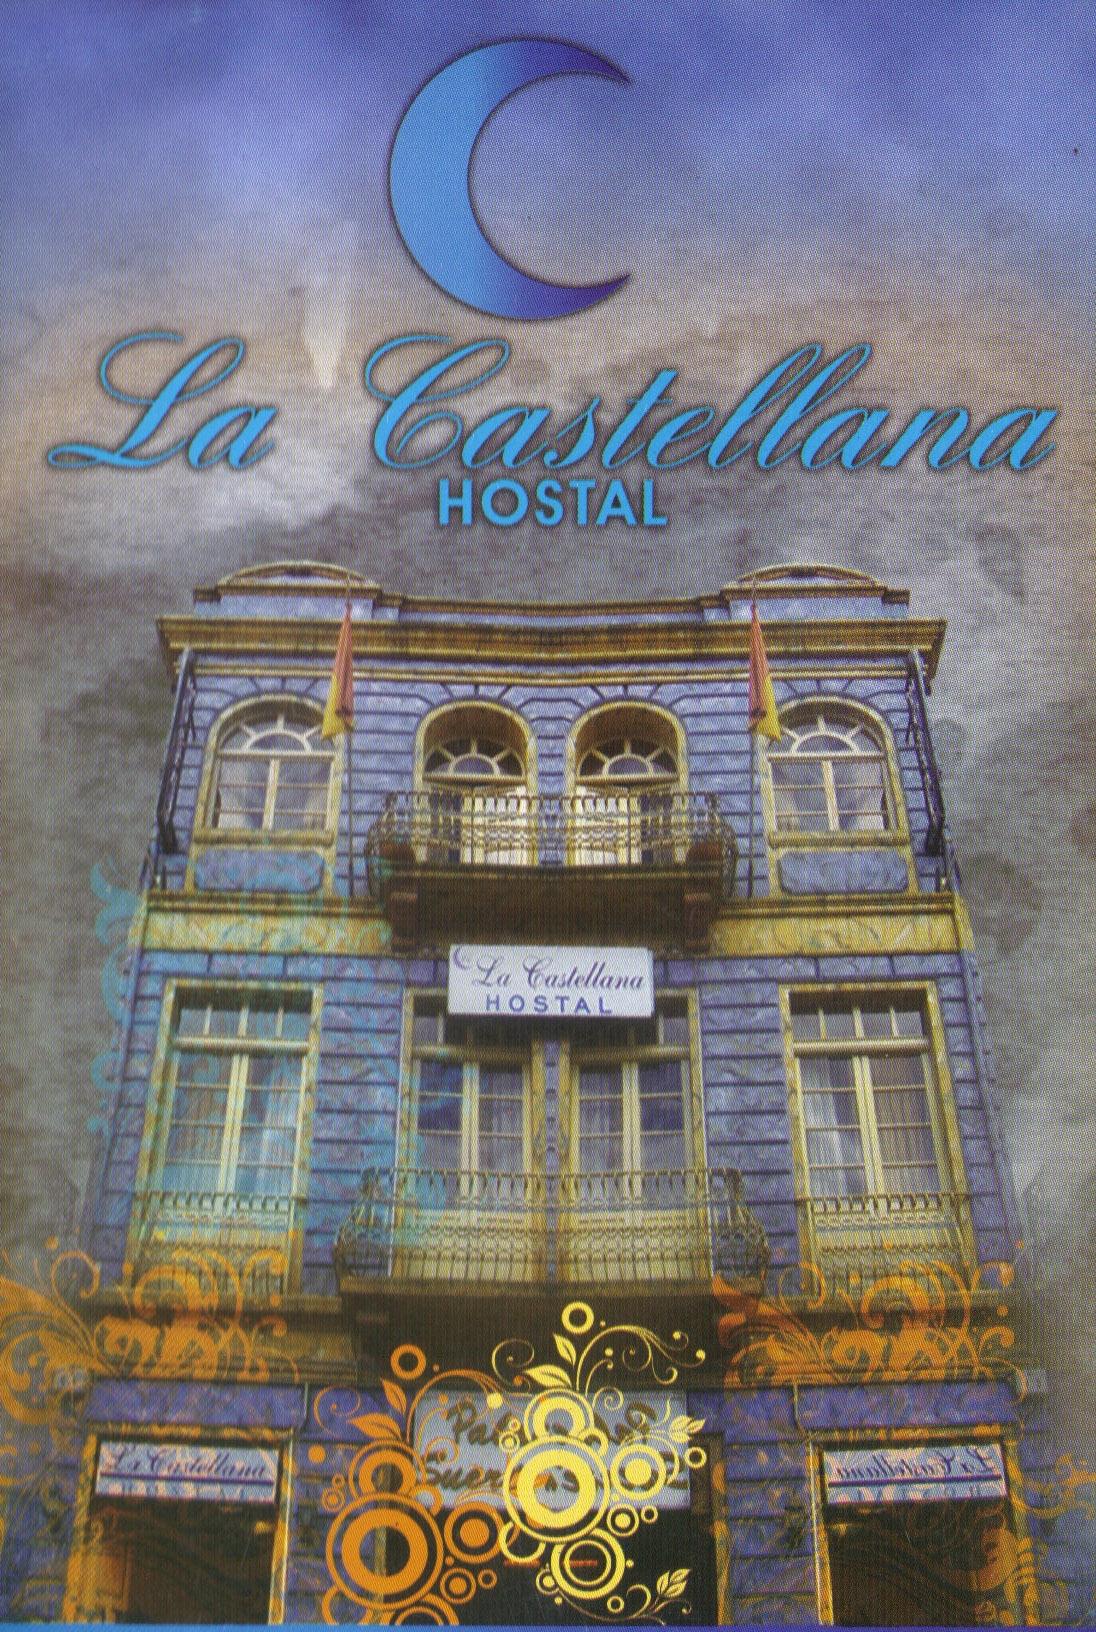 Hostal La Castellana